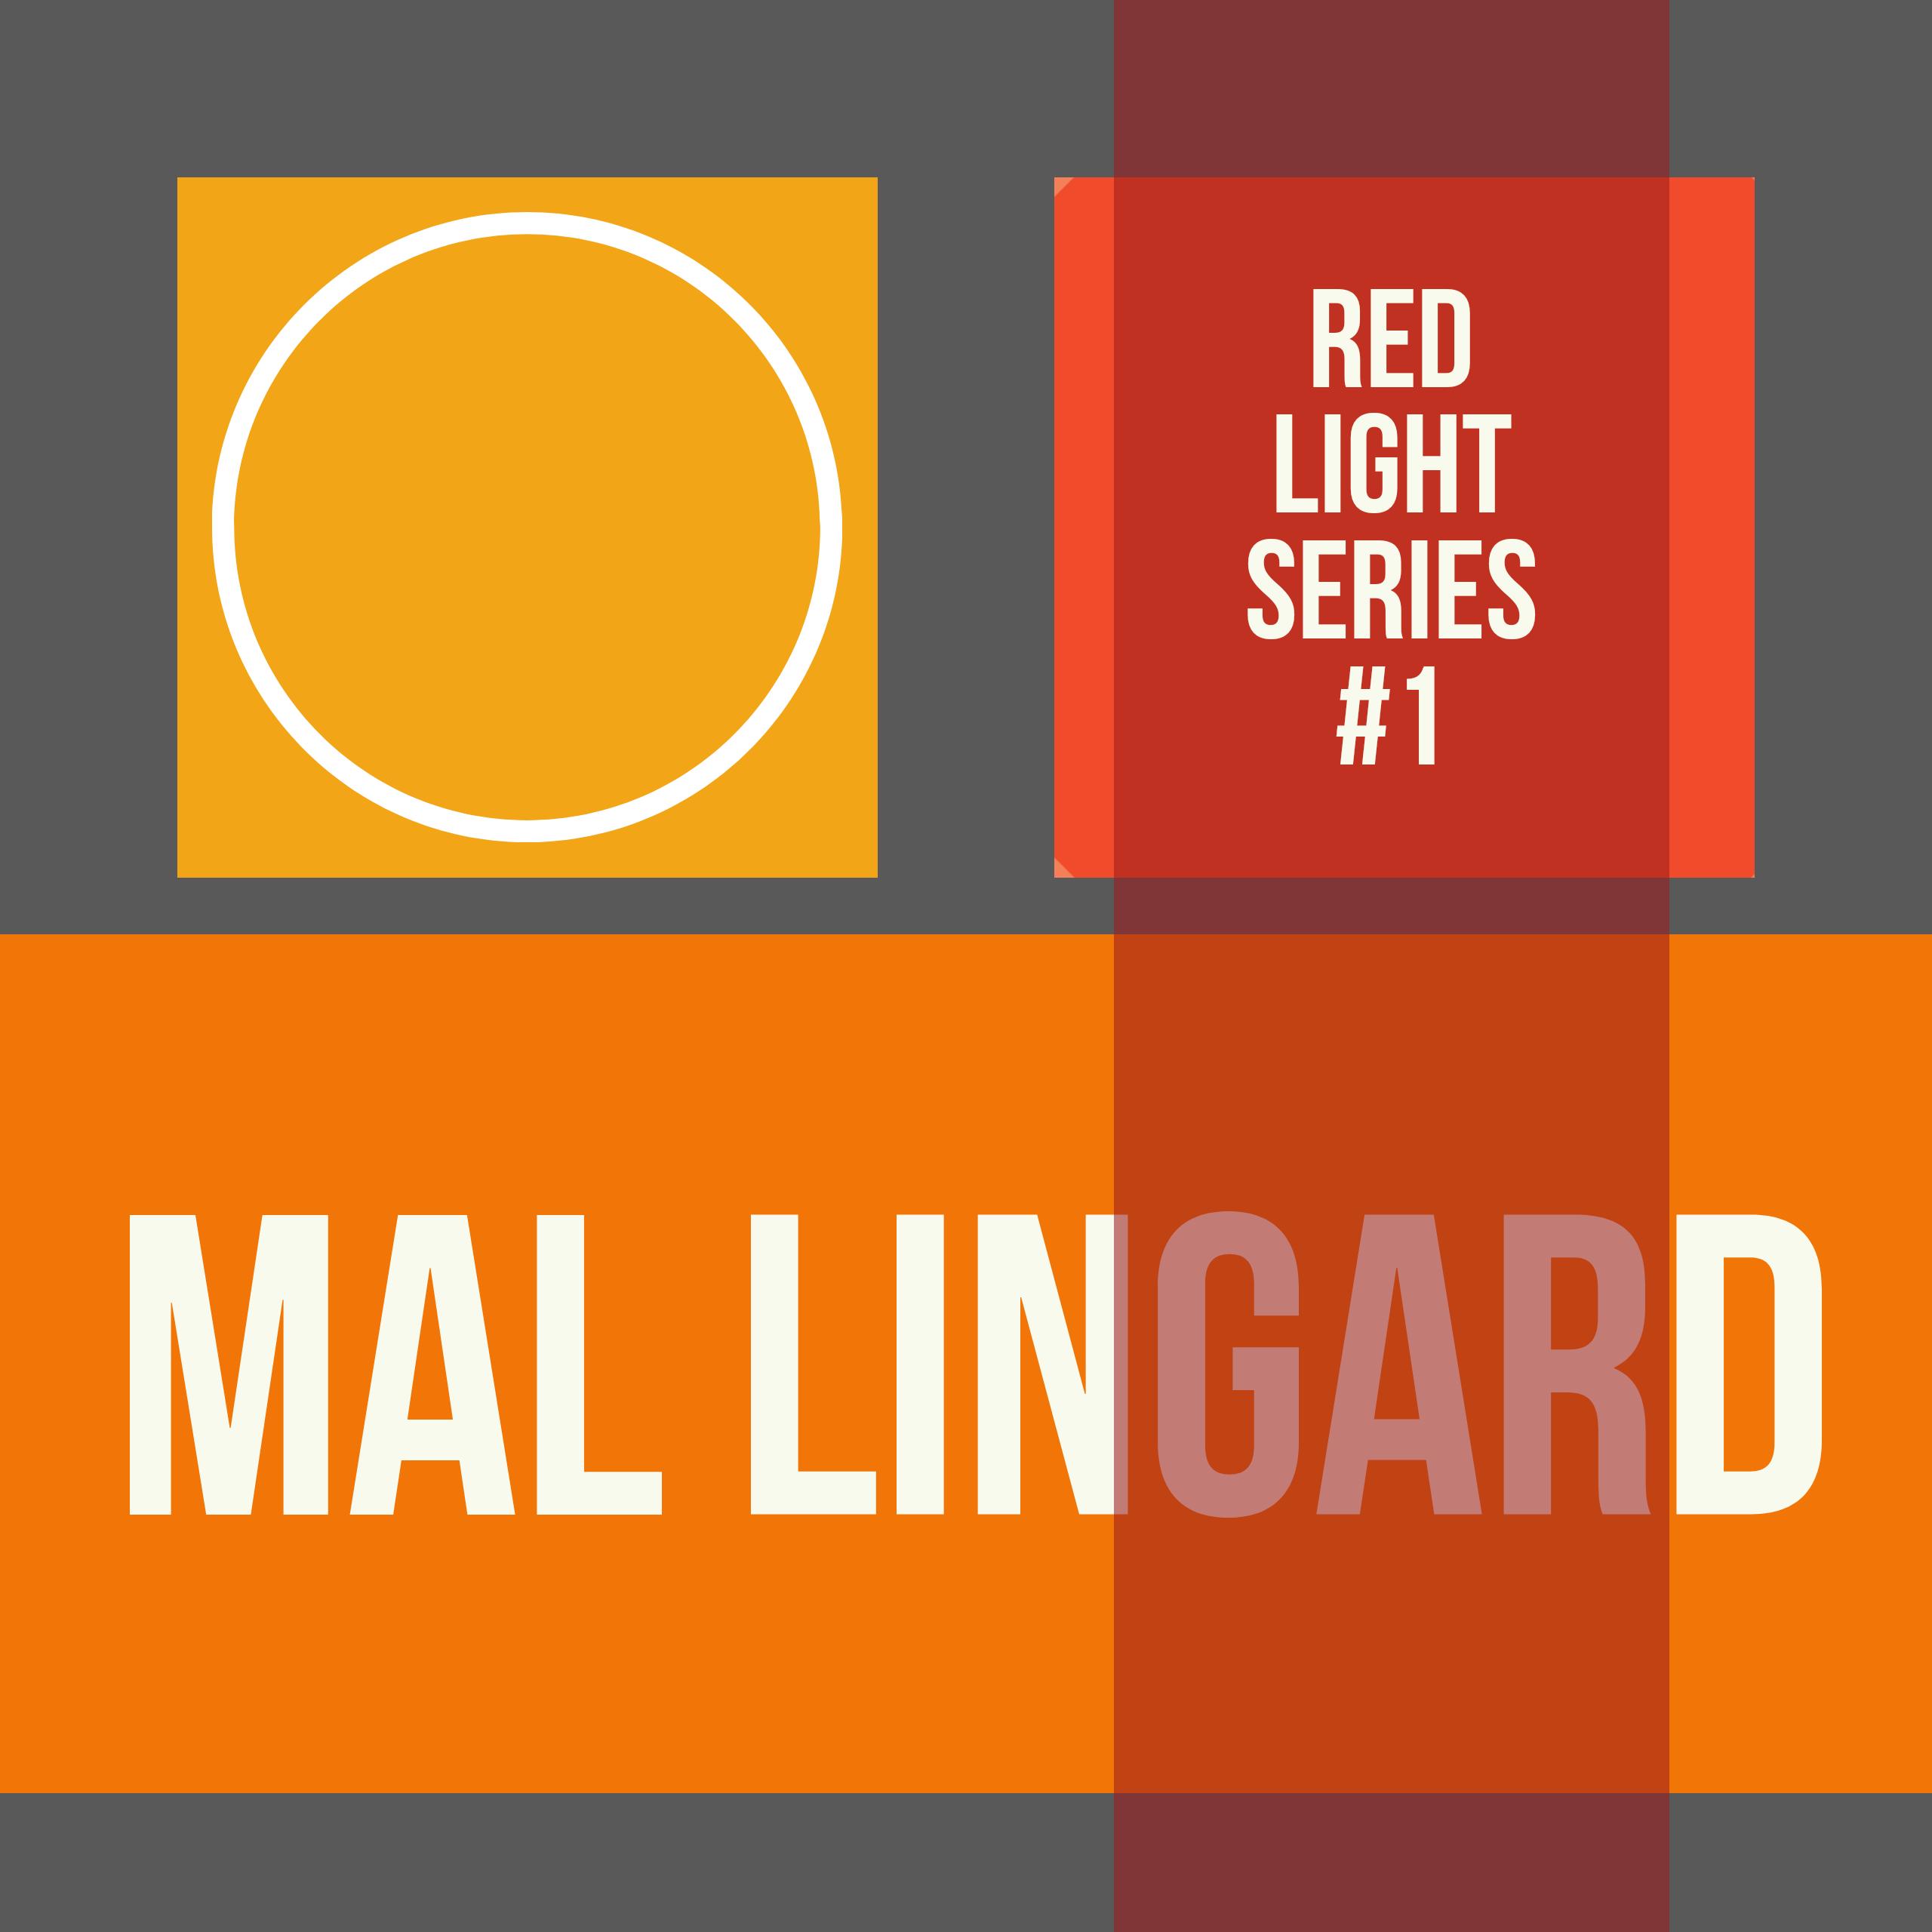 Mal Lingard - Red Light Series #1